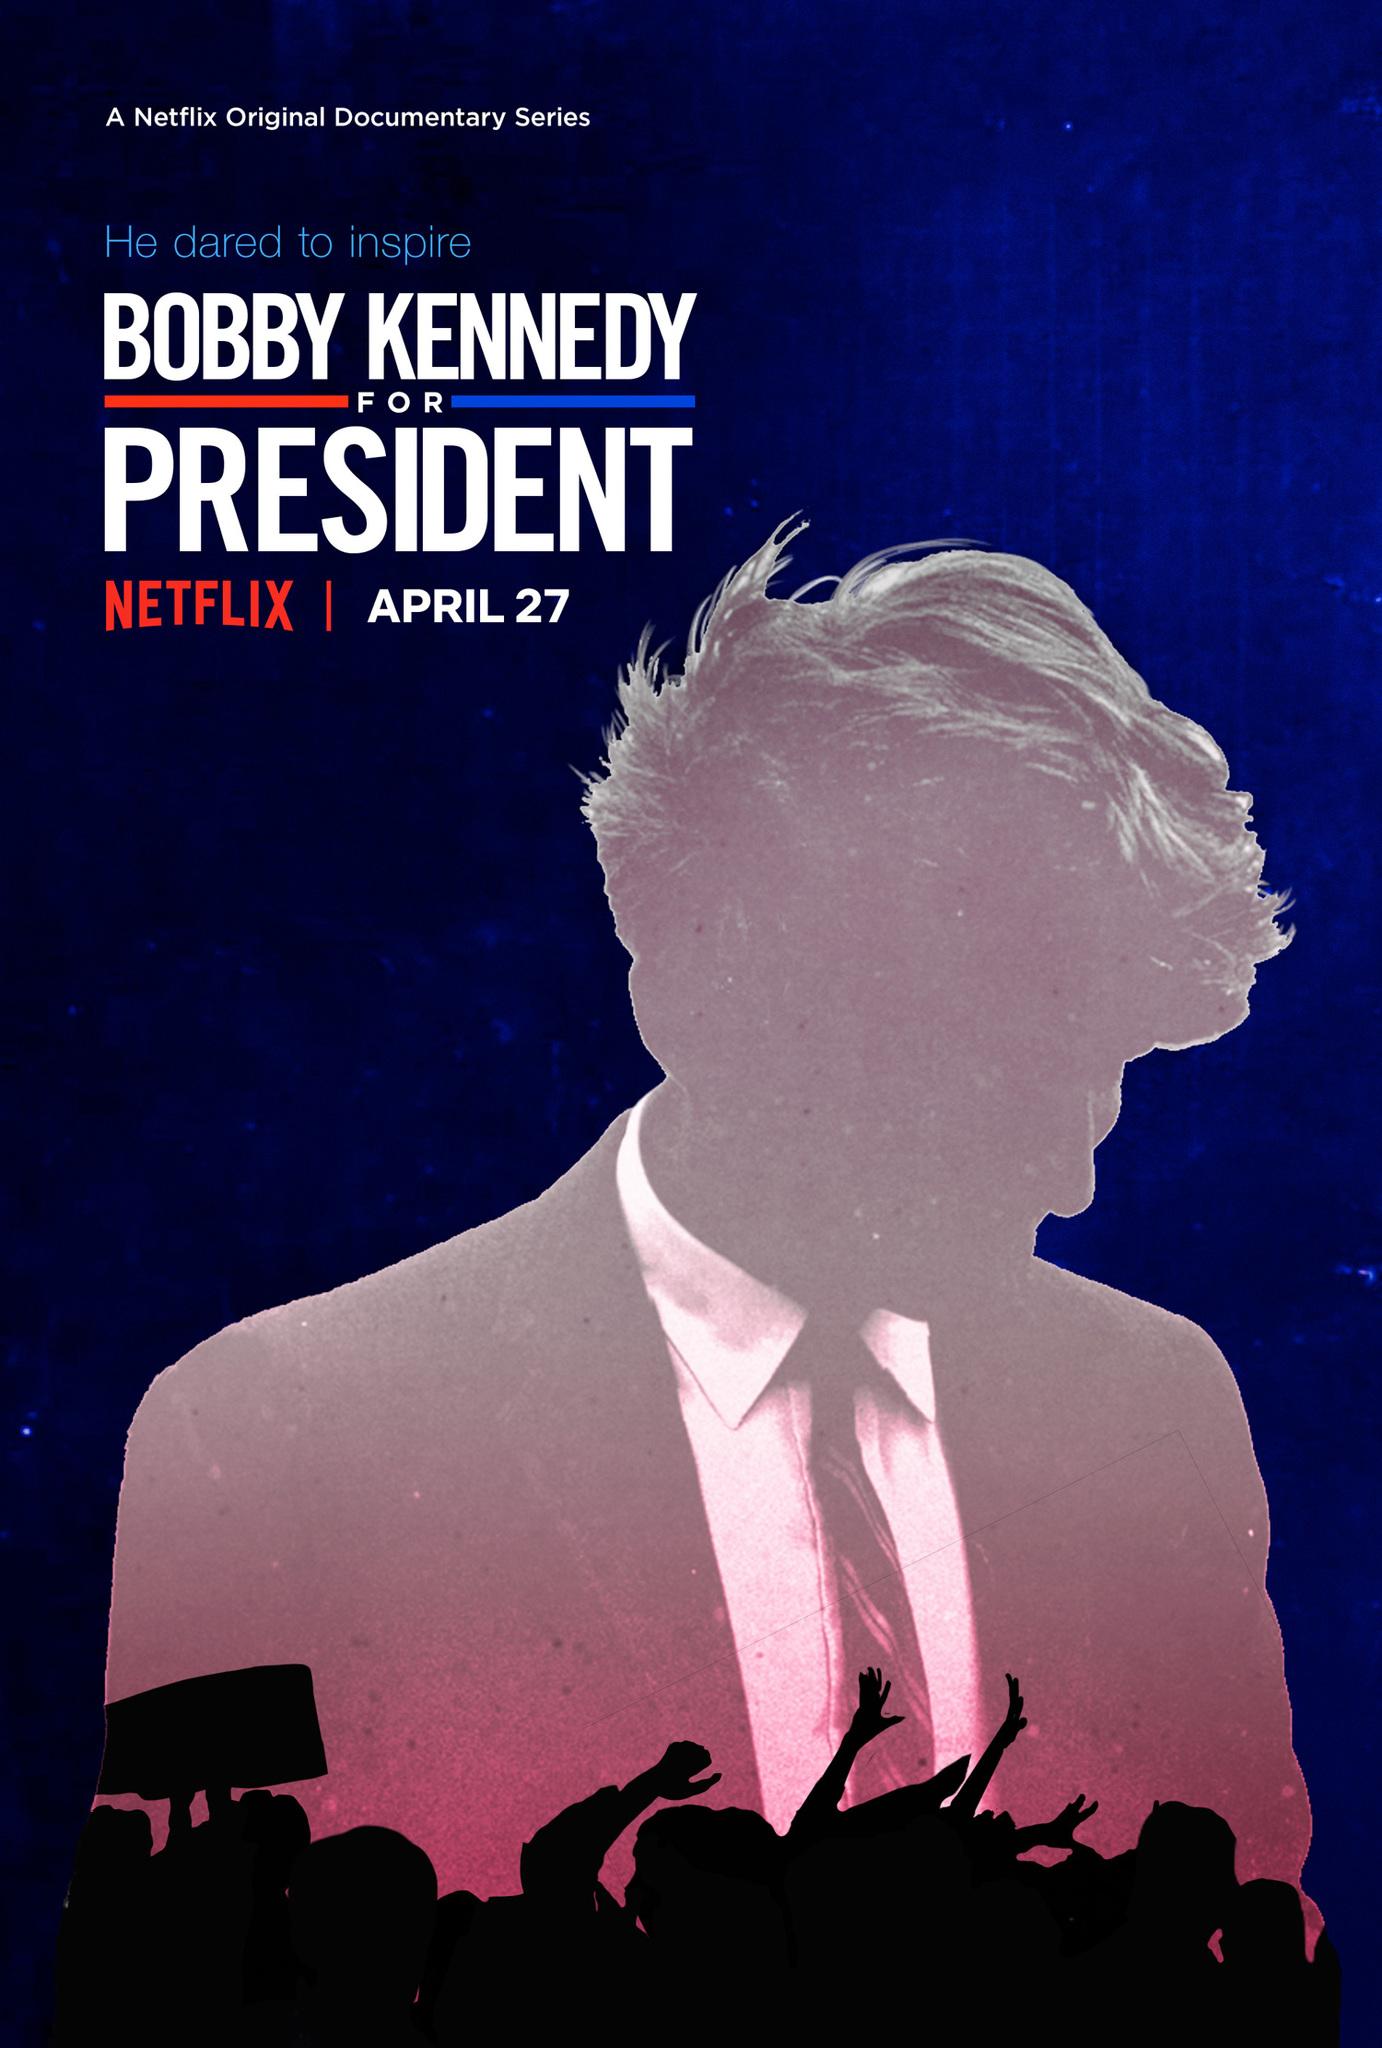 Bobby Kennedy for President (TV Mini-Series 2018) - IMDb